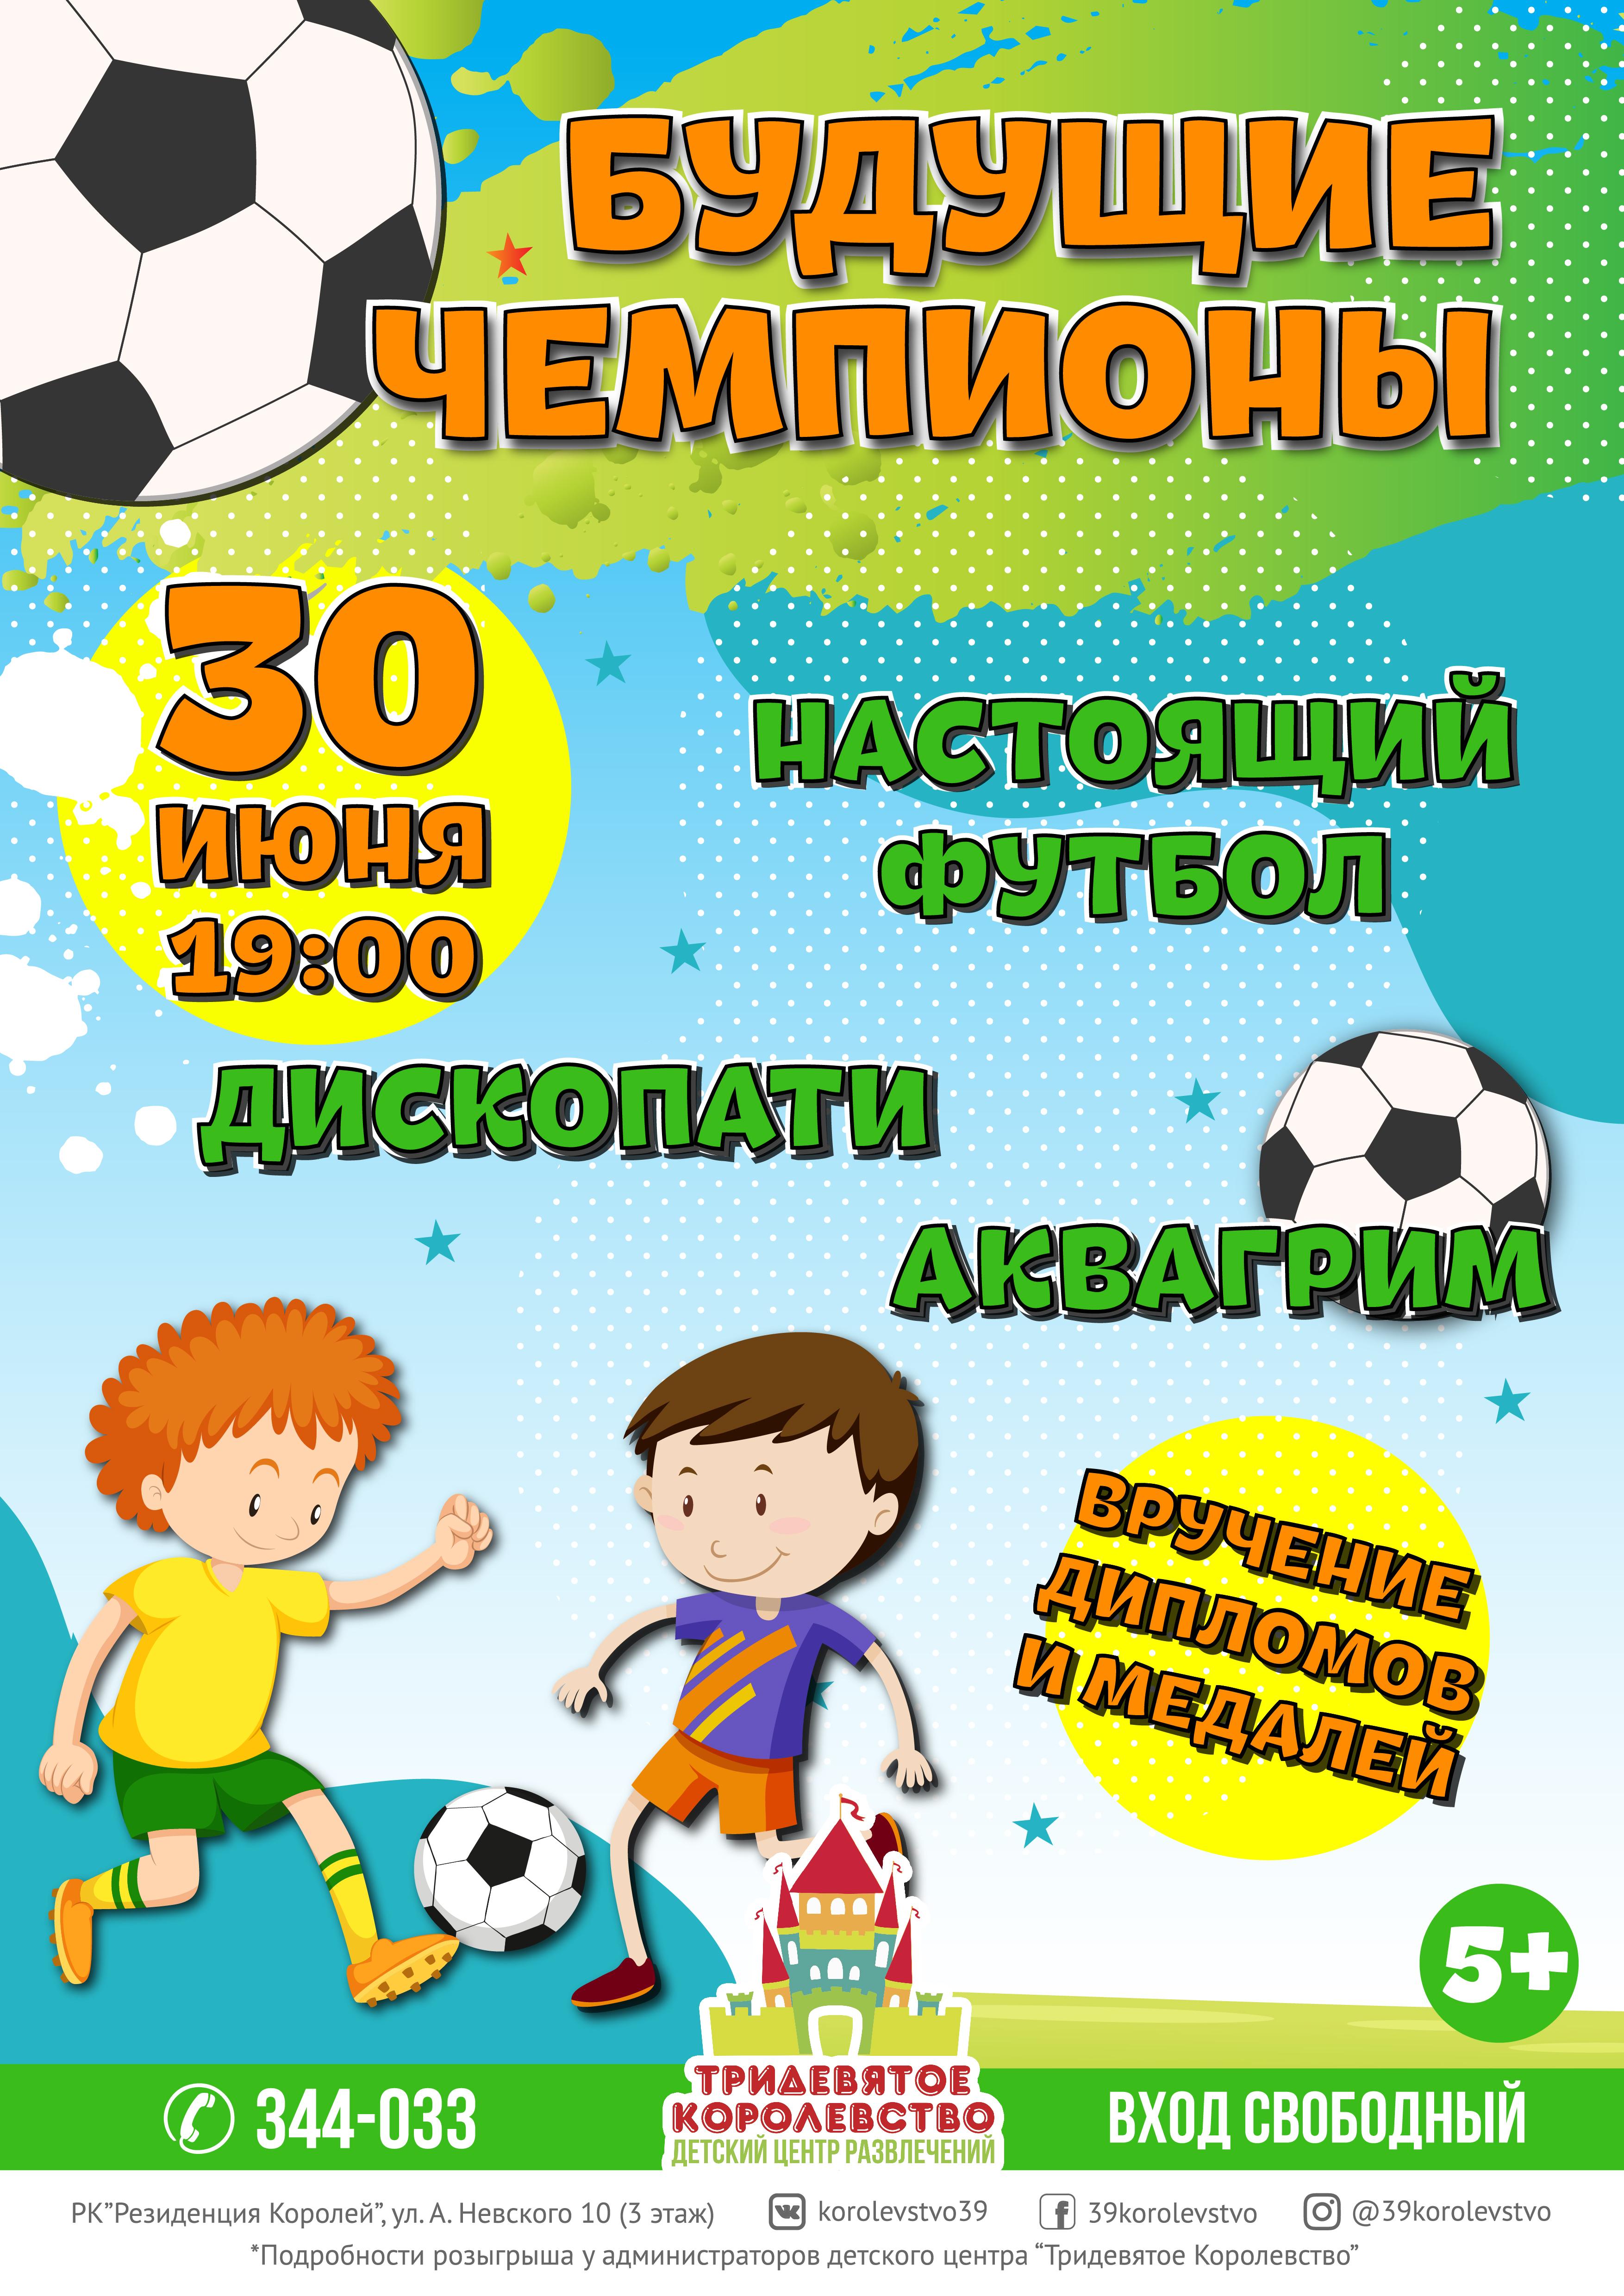 30 июня футбол А3